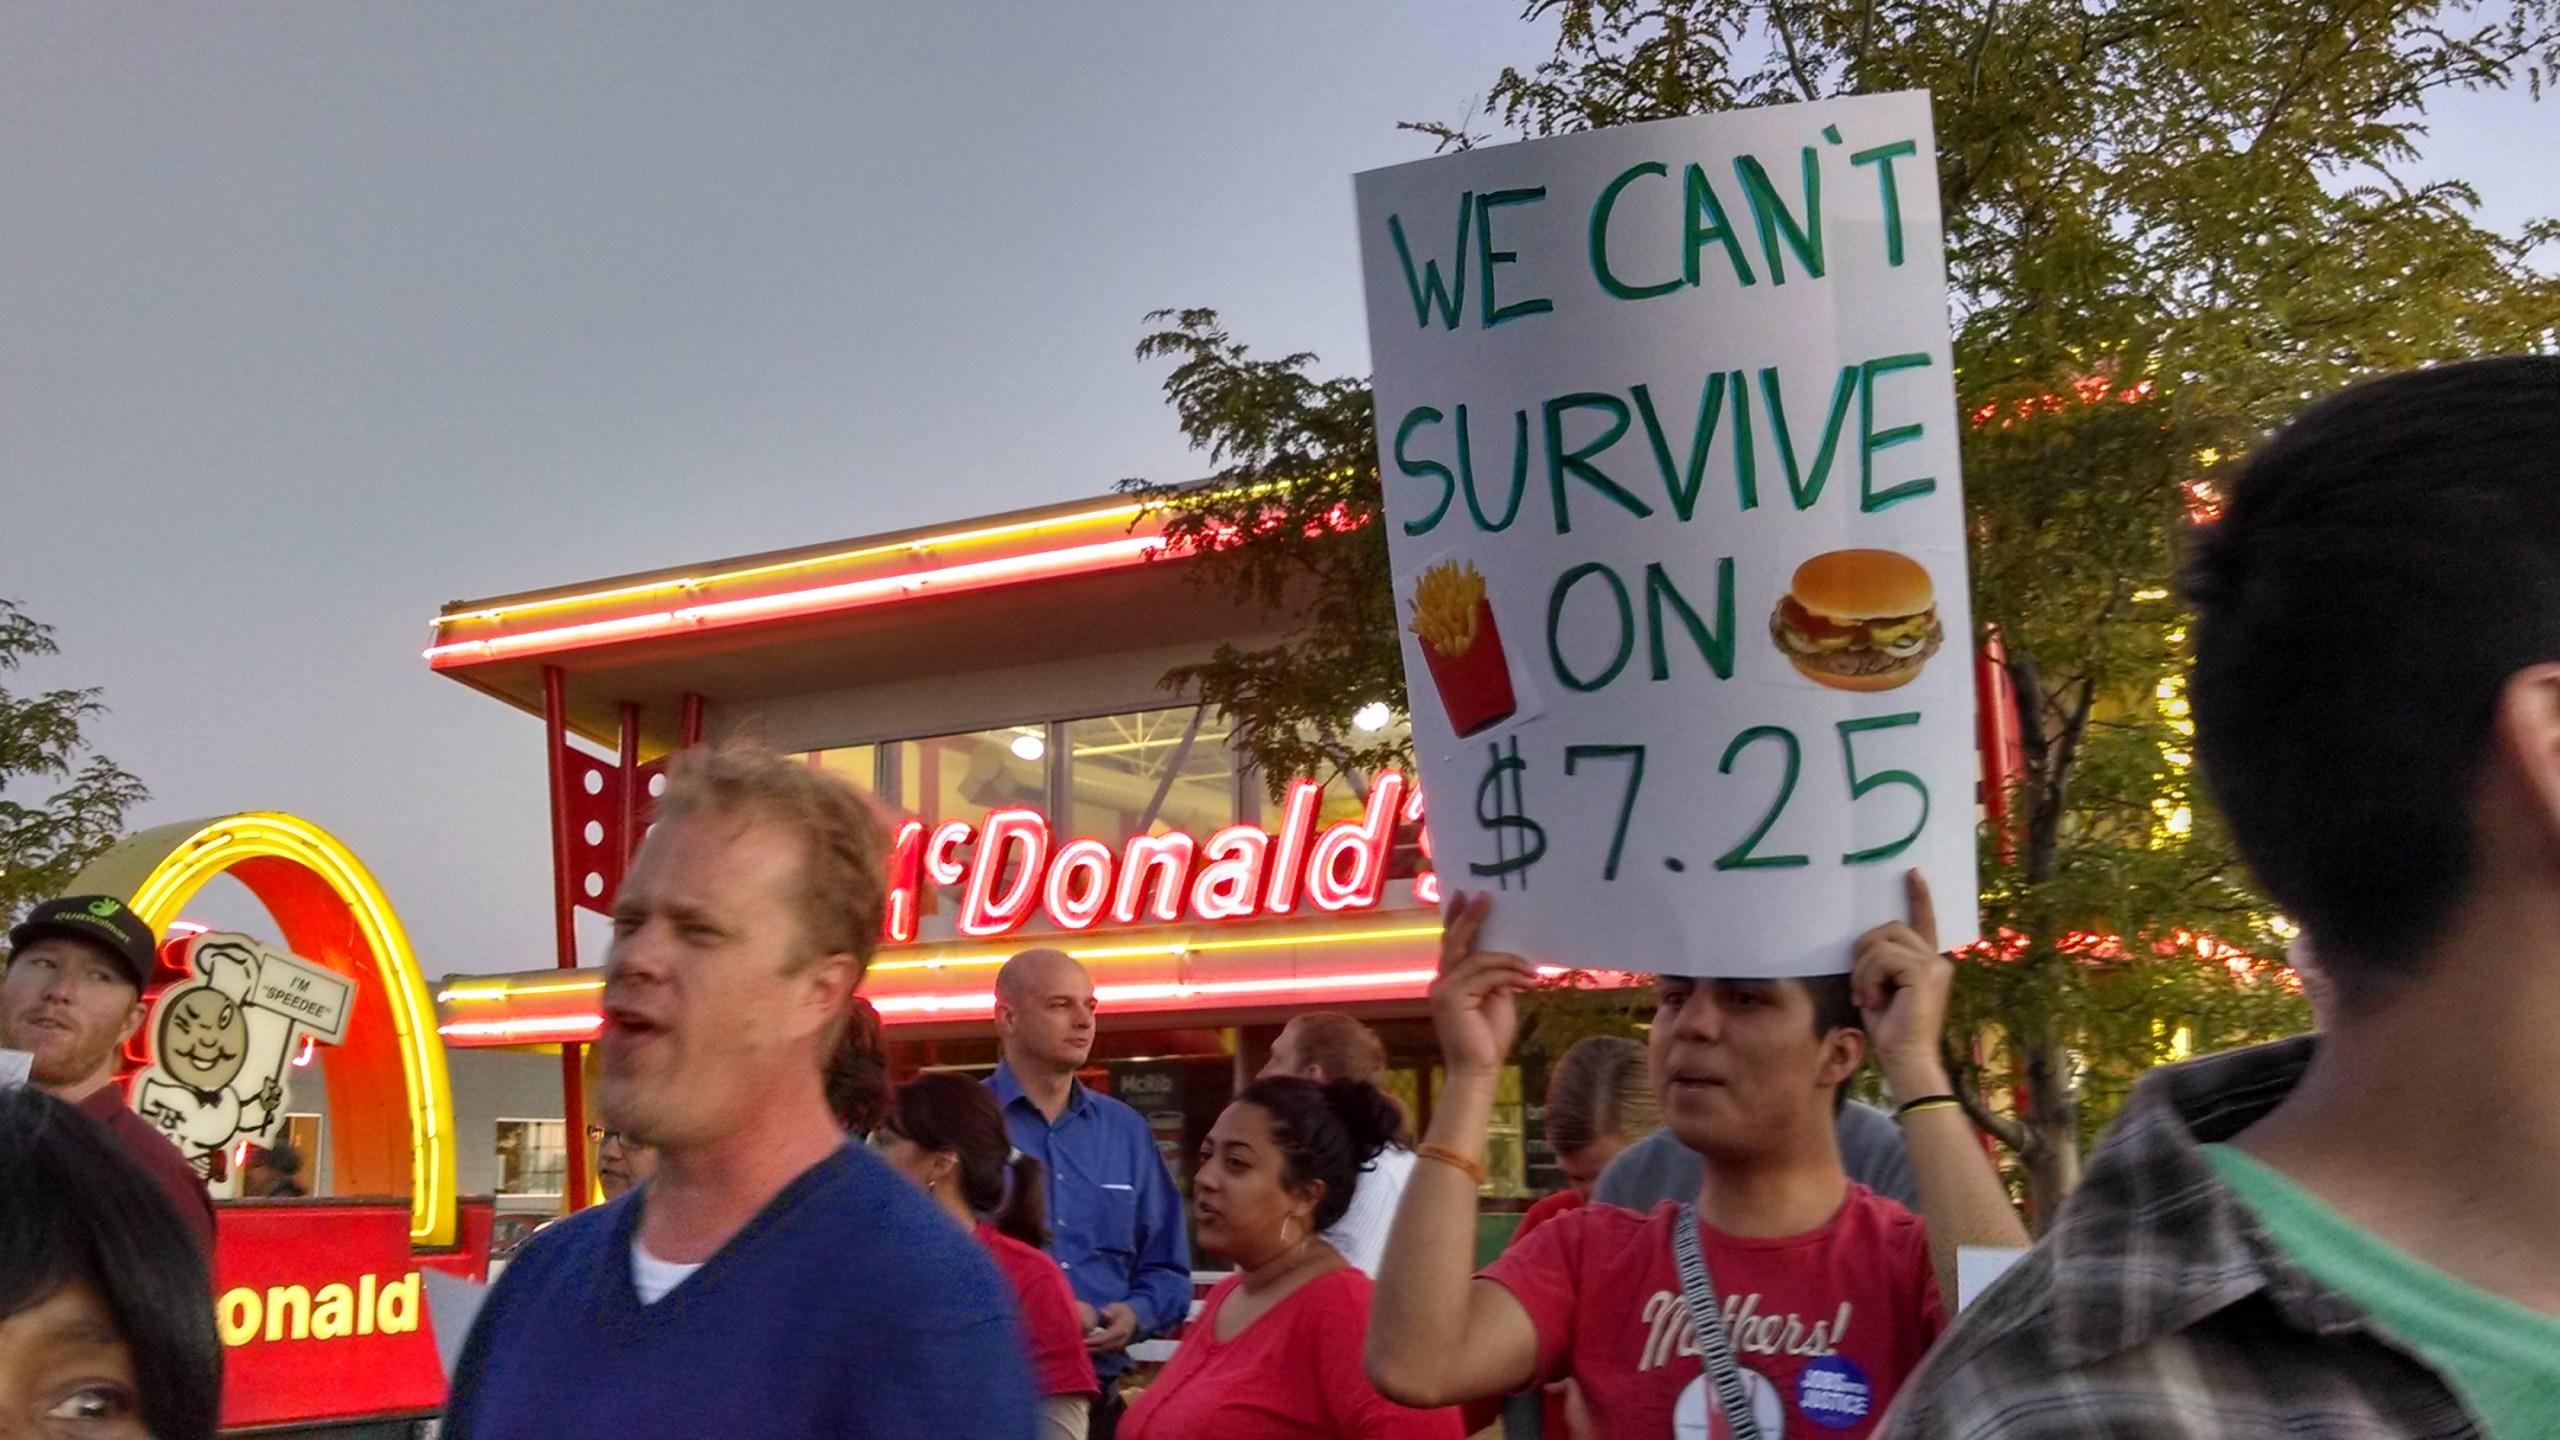 Fast food workers go on strike outside a Northglenn McDonald's on Aug. 29, 2013. (Photo: Shaul Turner)